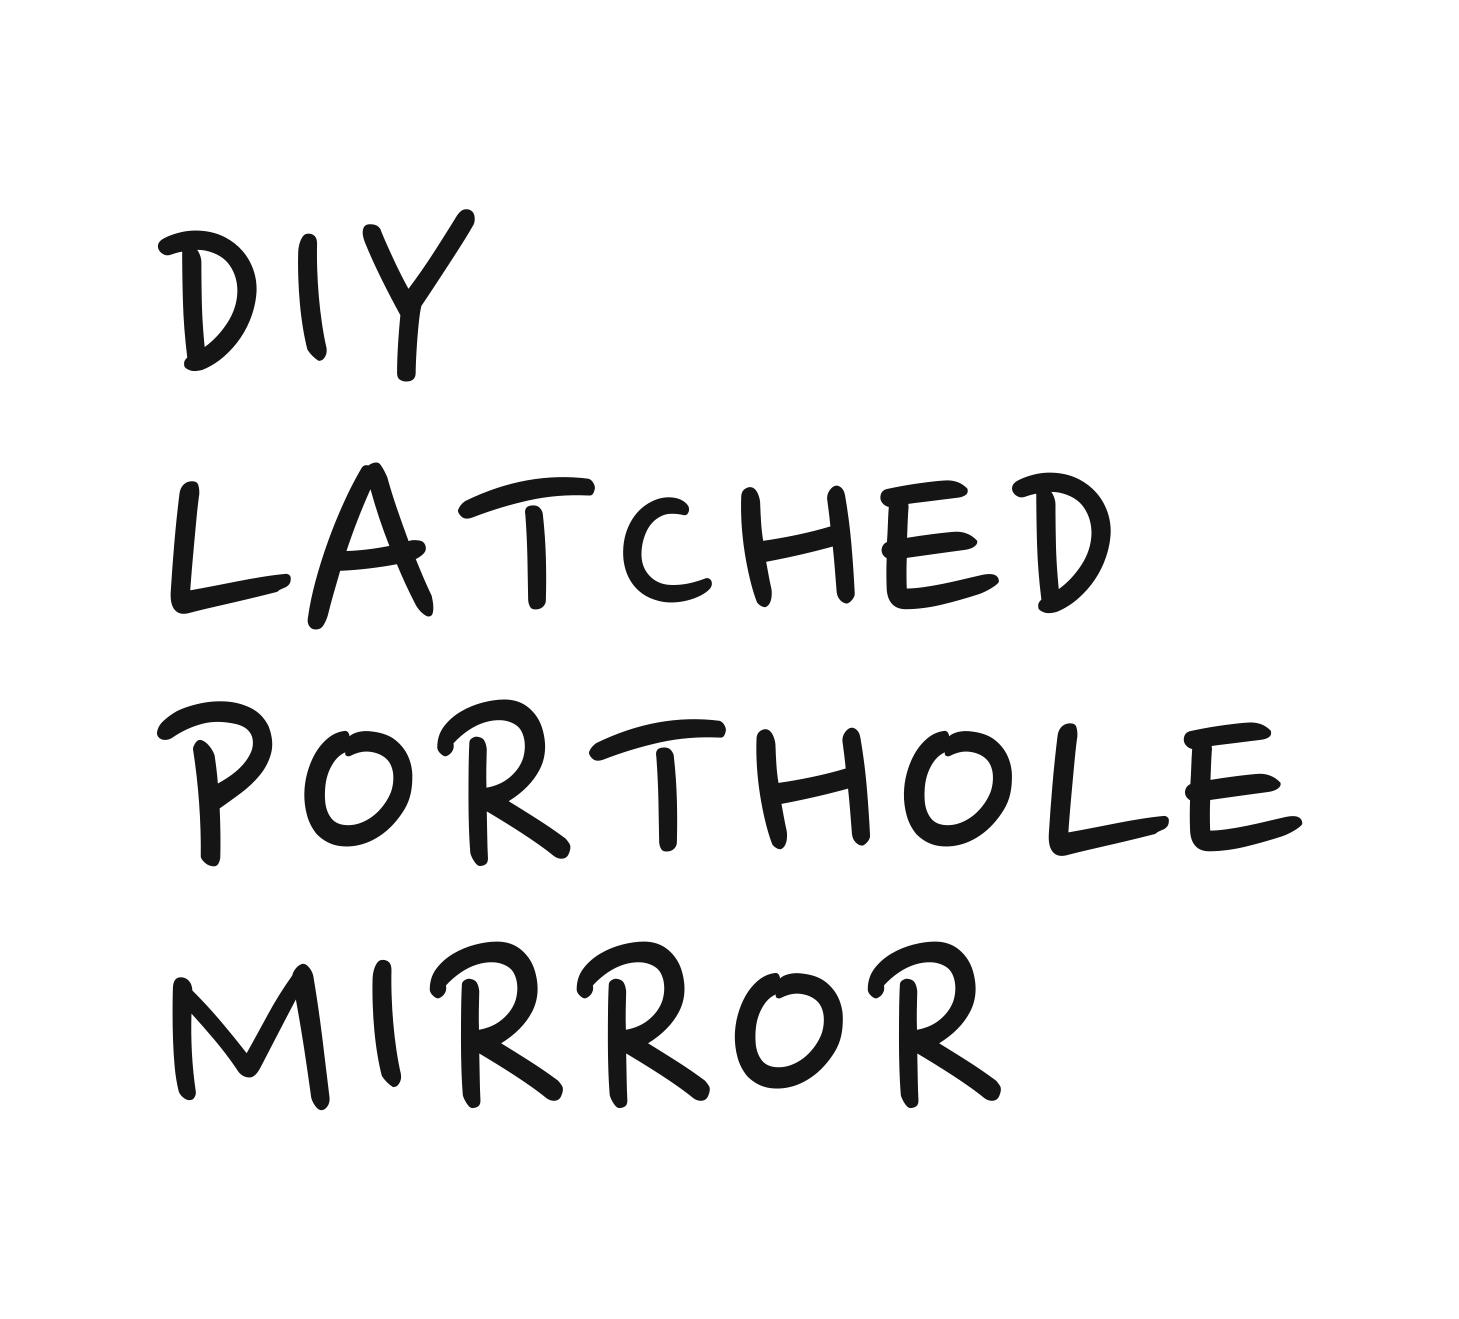 LatchedPortholeMirrorBlock.png